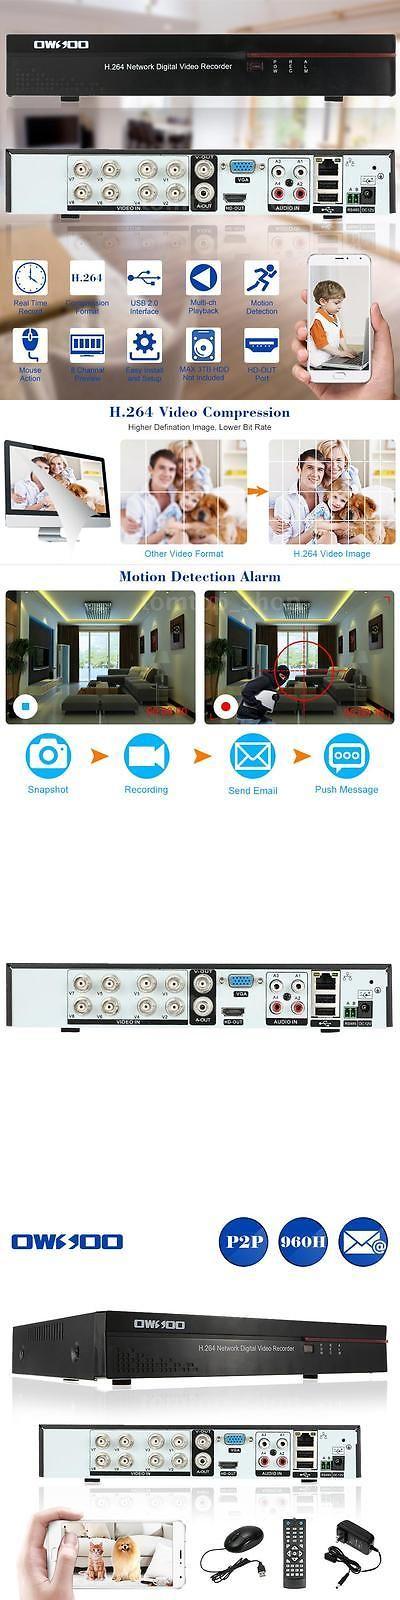 house of cards s01e06 720p vs 960h